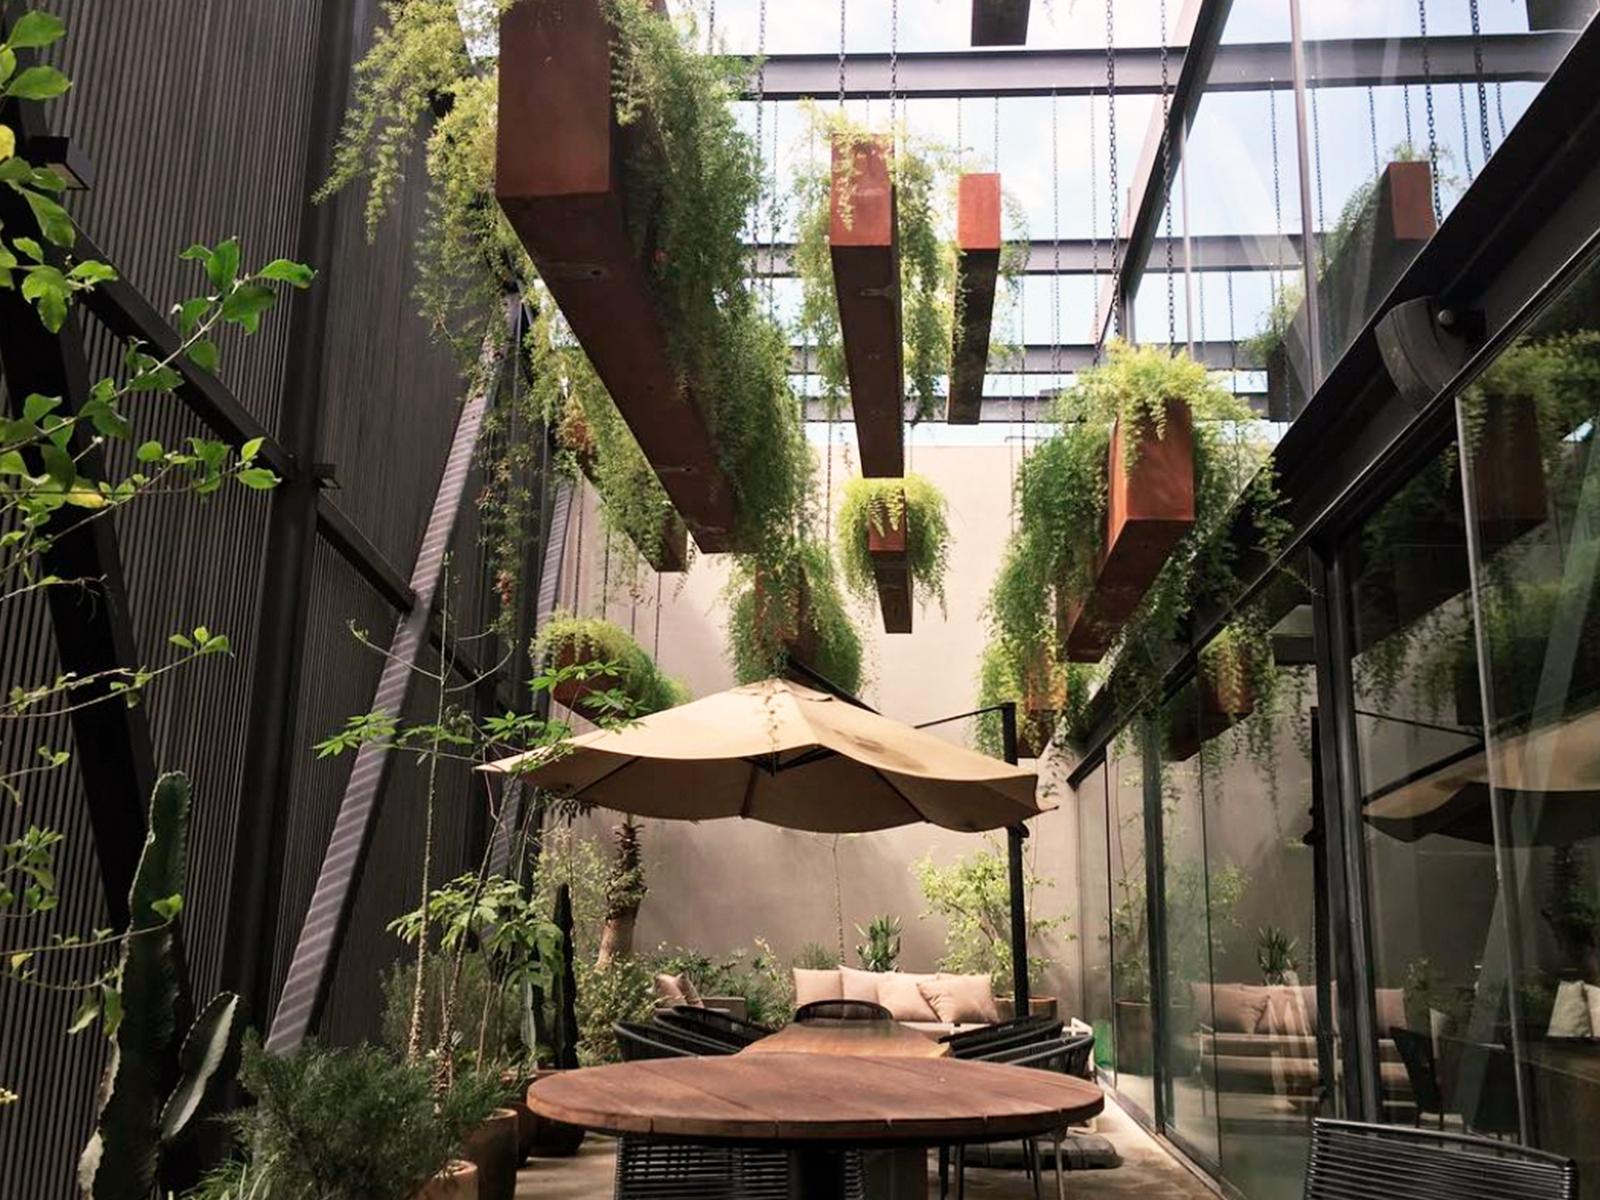 blog-vegetacion-decoracion-bares-restaurantes-19_HIDROJARDIN-Bañeres